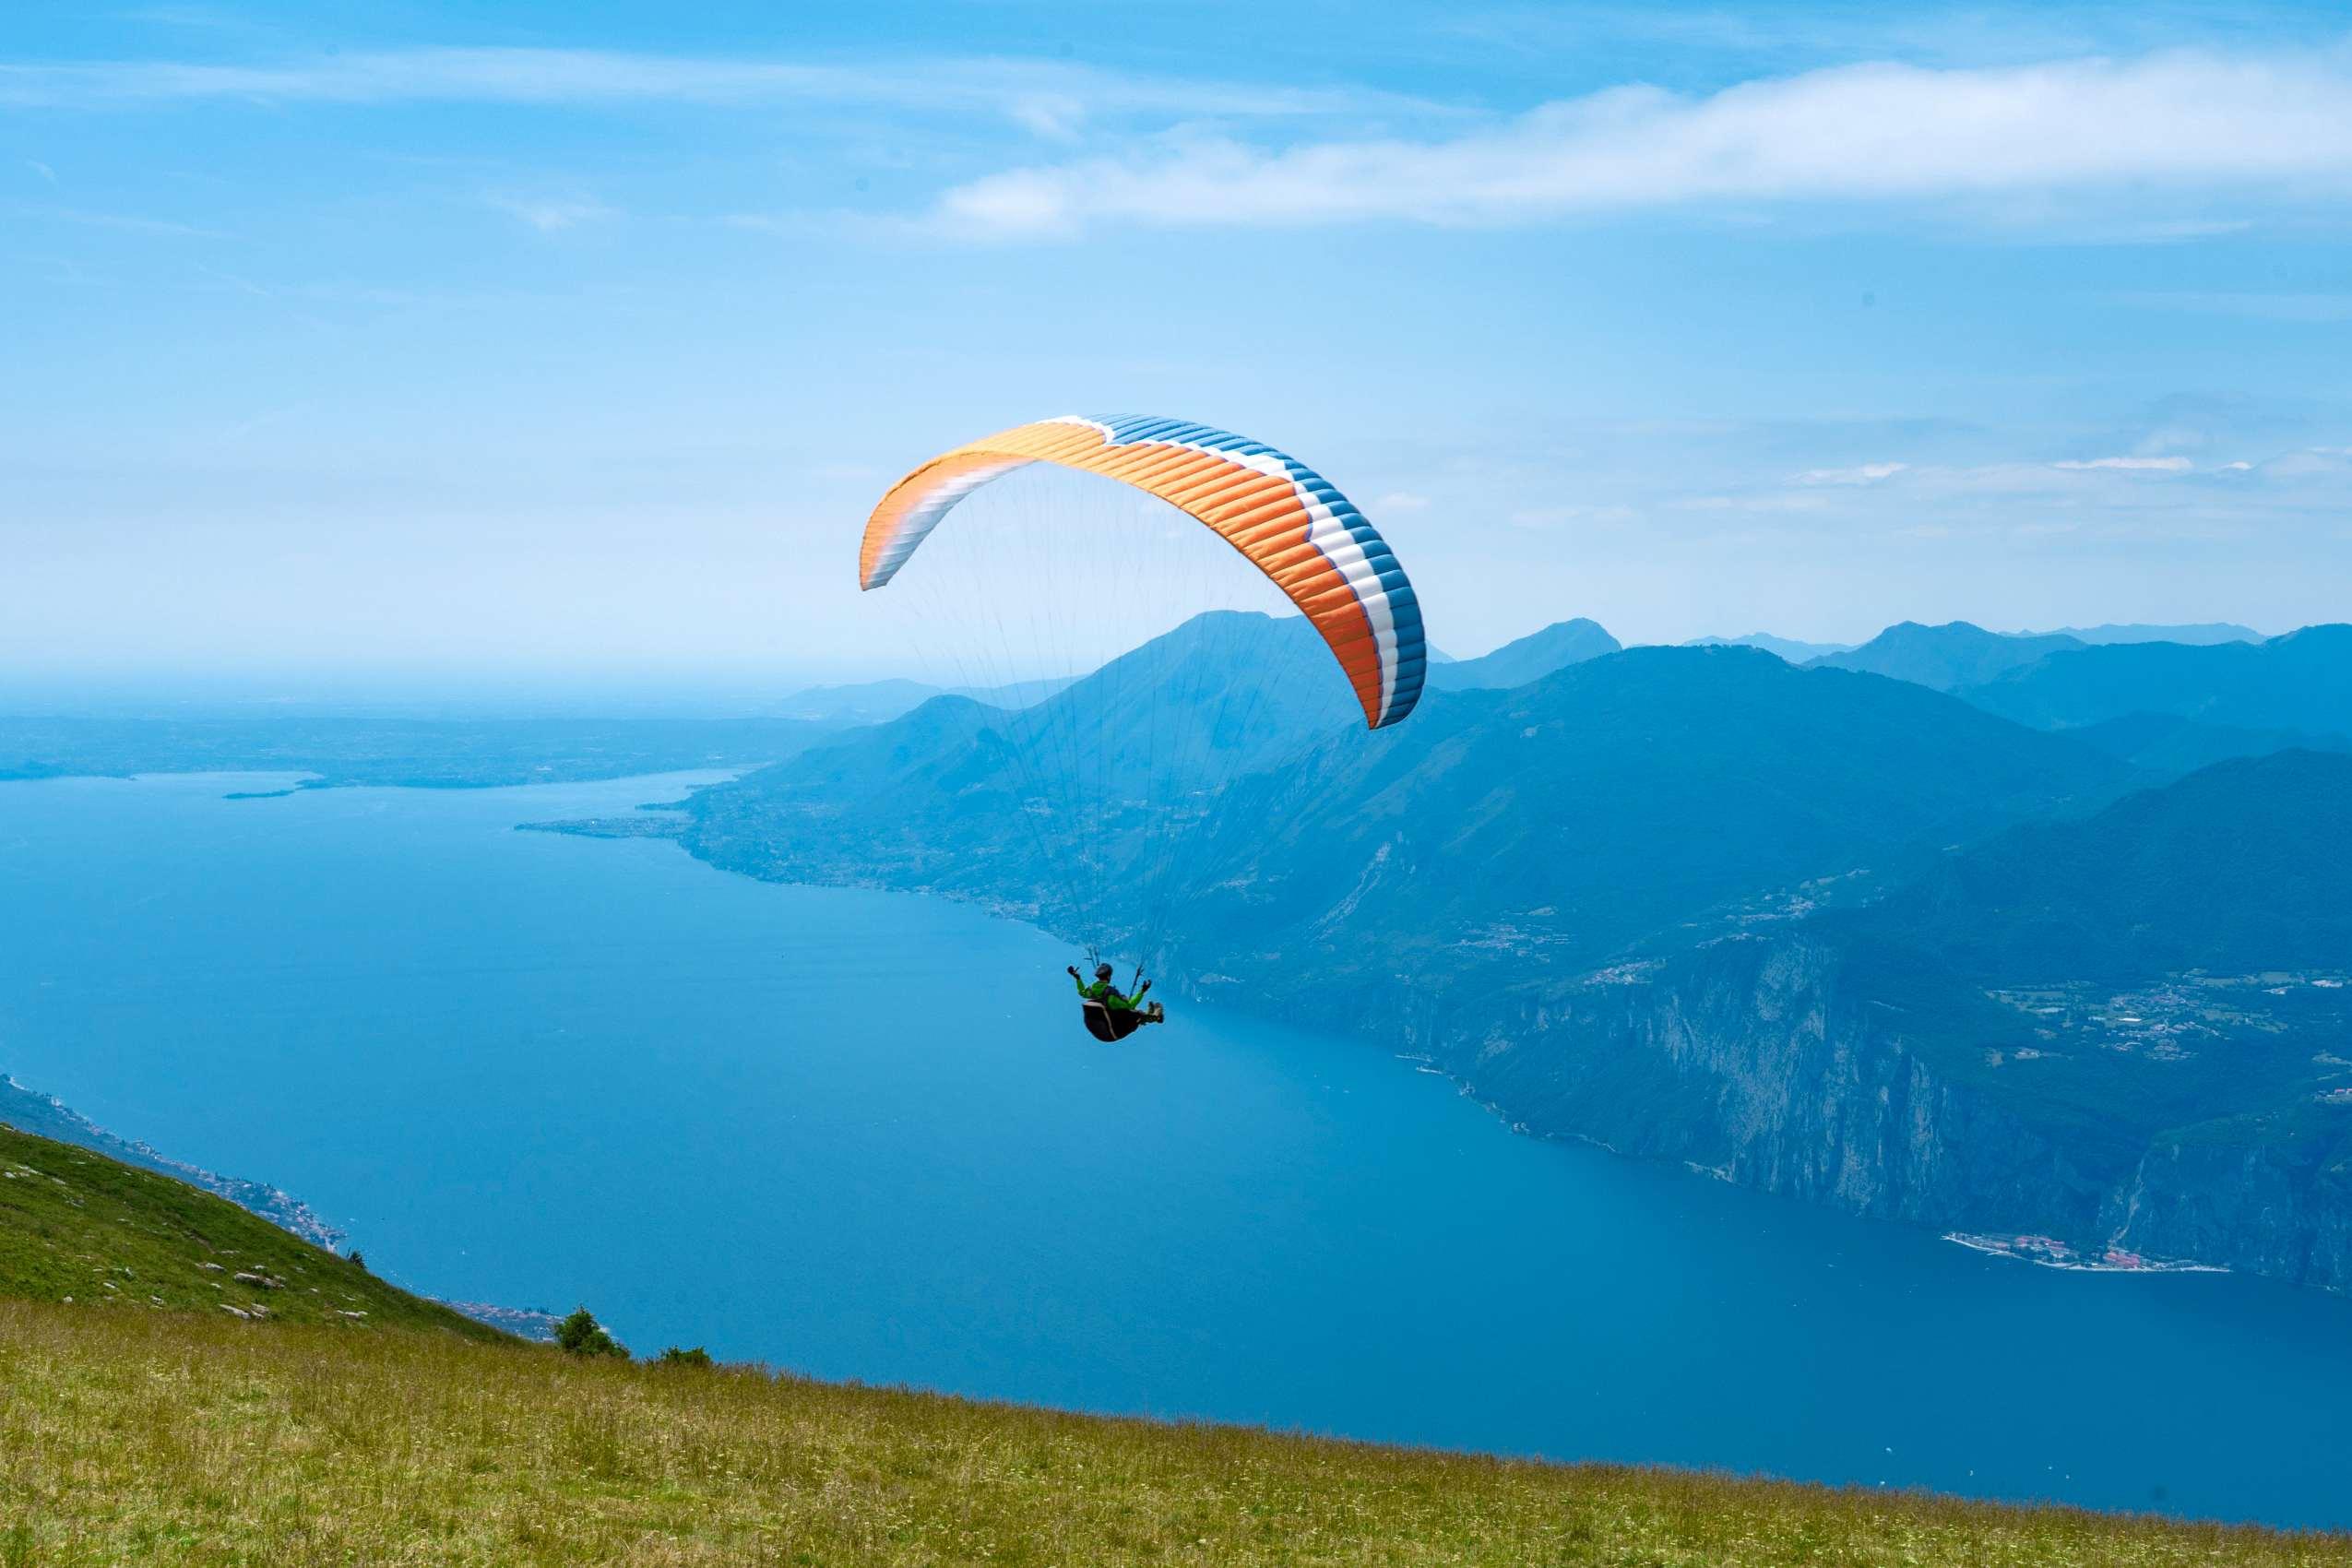 Aktivurlaub am Gardasee: Paragliding